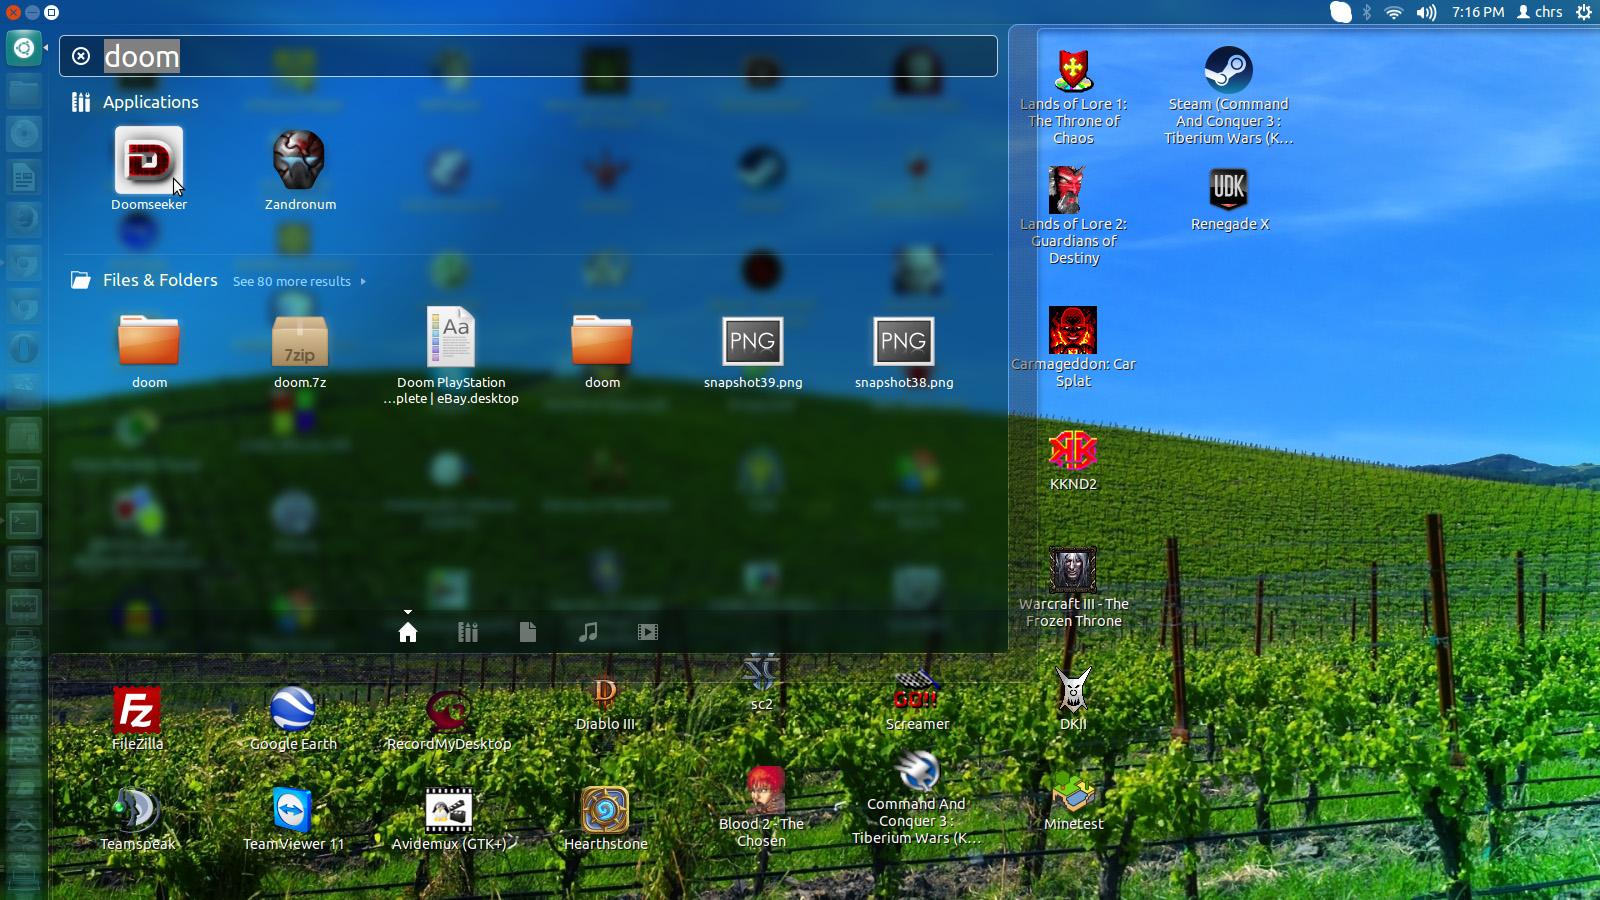 ubuntu_unity_dash_doomseeker.jpg